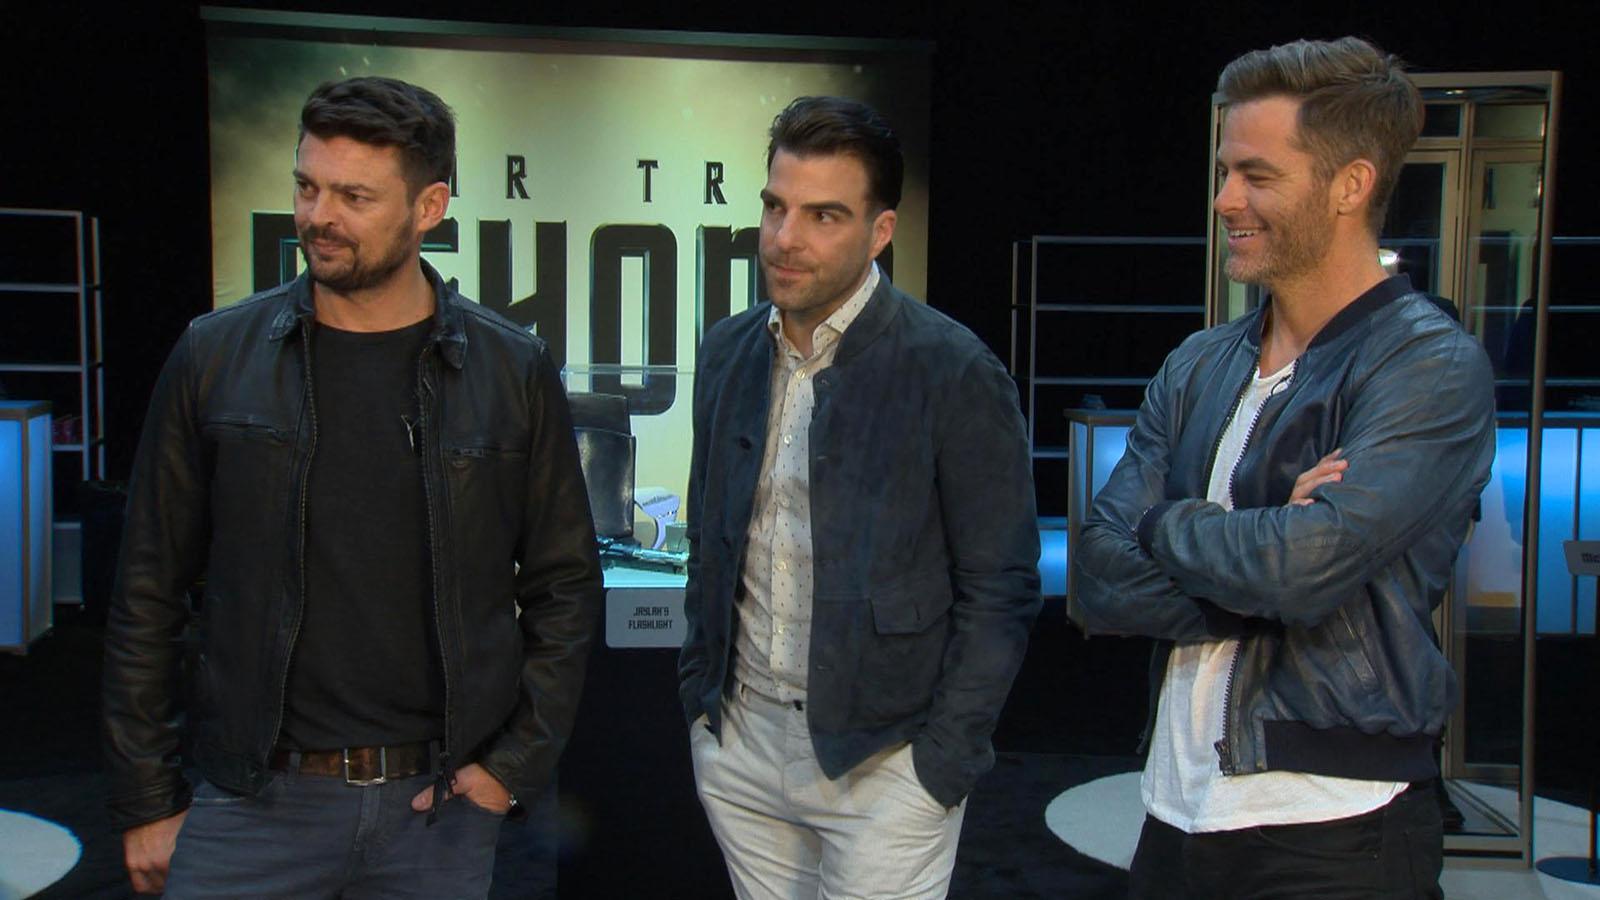 Karl Urban, Zachary Quinto & Chris Pine Tease 'Star Trek Beyond'